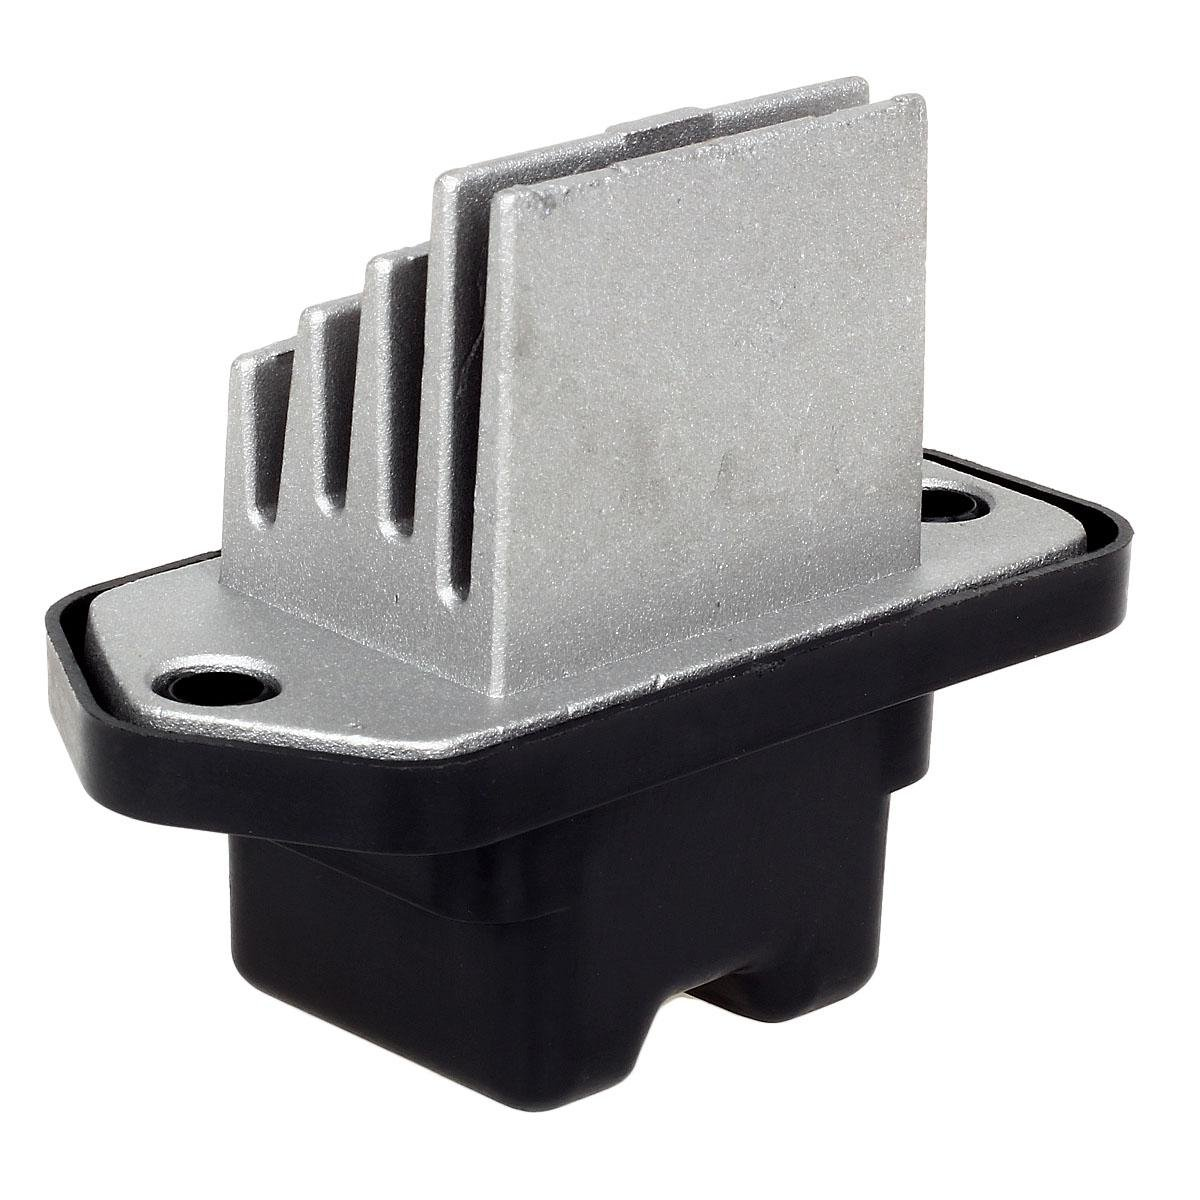 PartsSquare Manual HVAC Blower Motor Resistor JA1382 79330S6M941 Replacement for 2002 2003 2004 2005 2006 ACURA RSX 2004 2005 2006 2007 2008 ACURA TL 2003 2004 2005 2006 2007 HONDA ACCORD